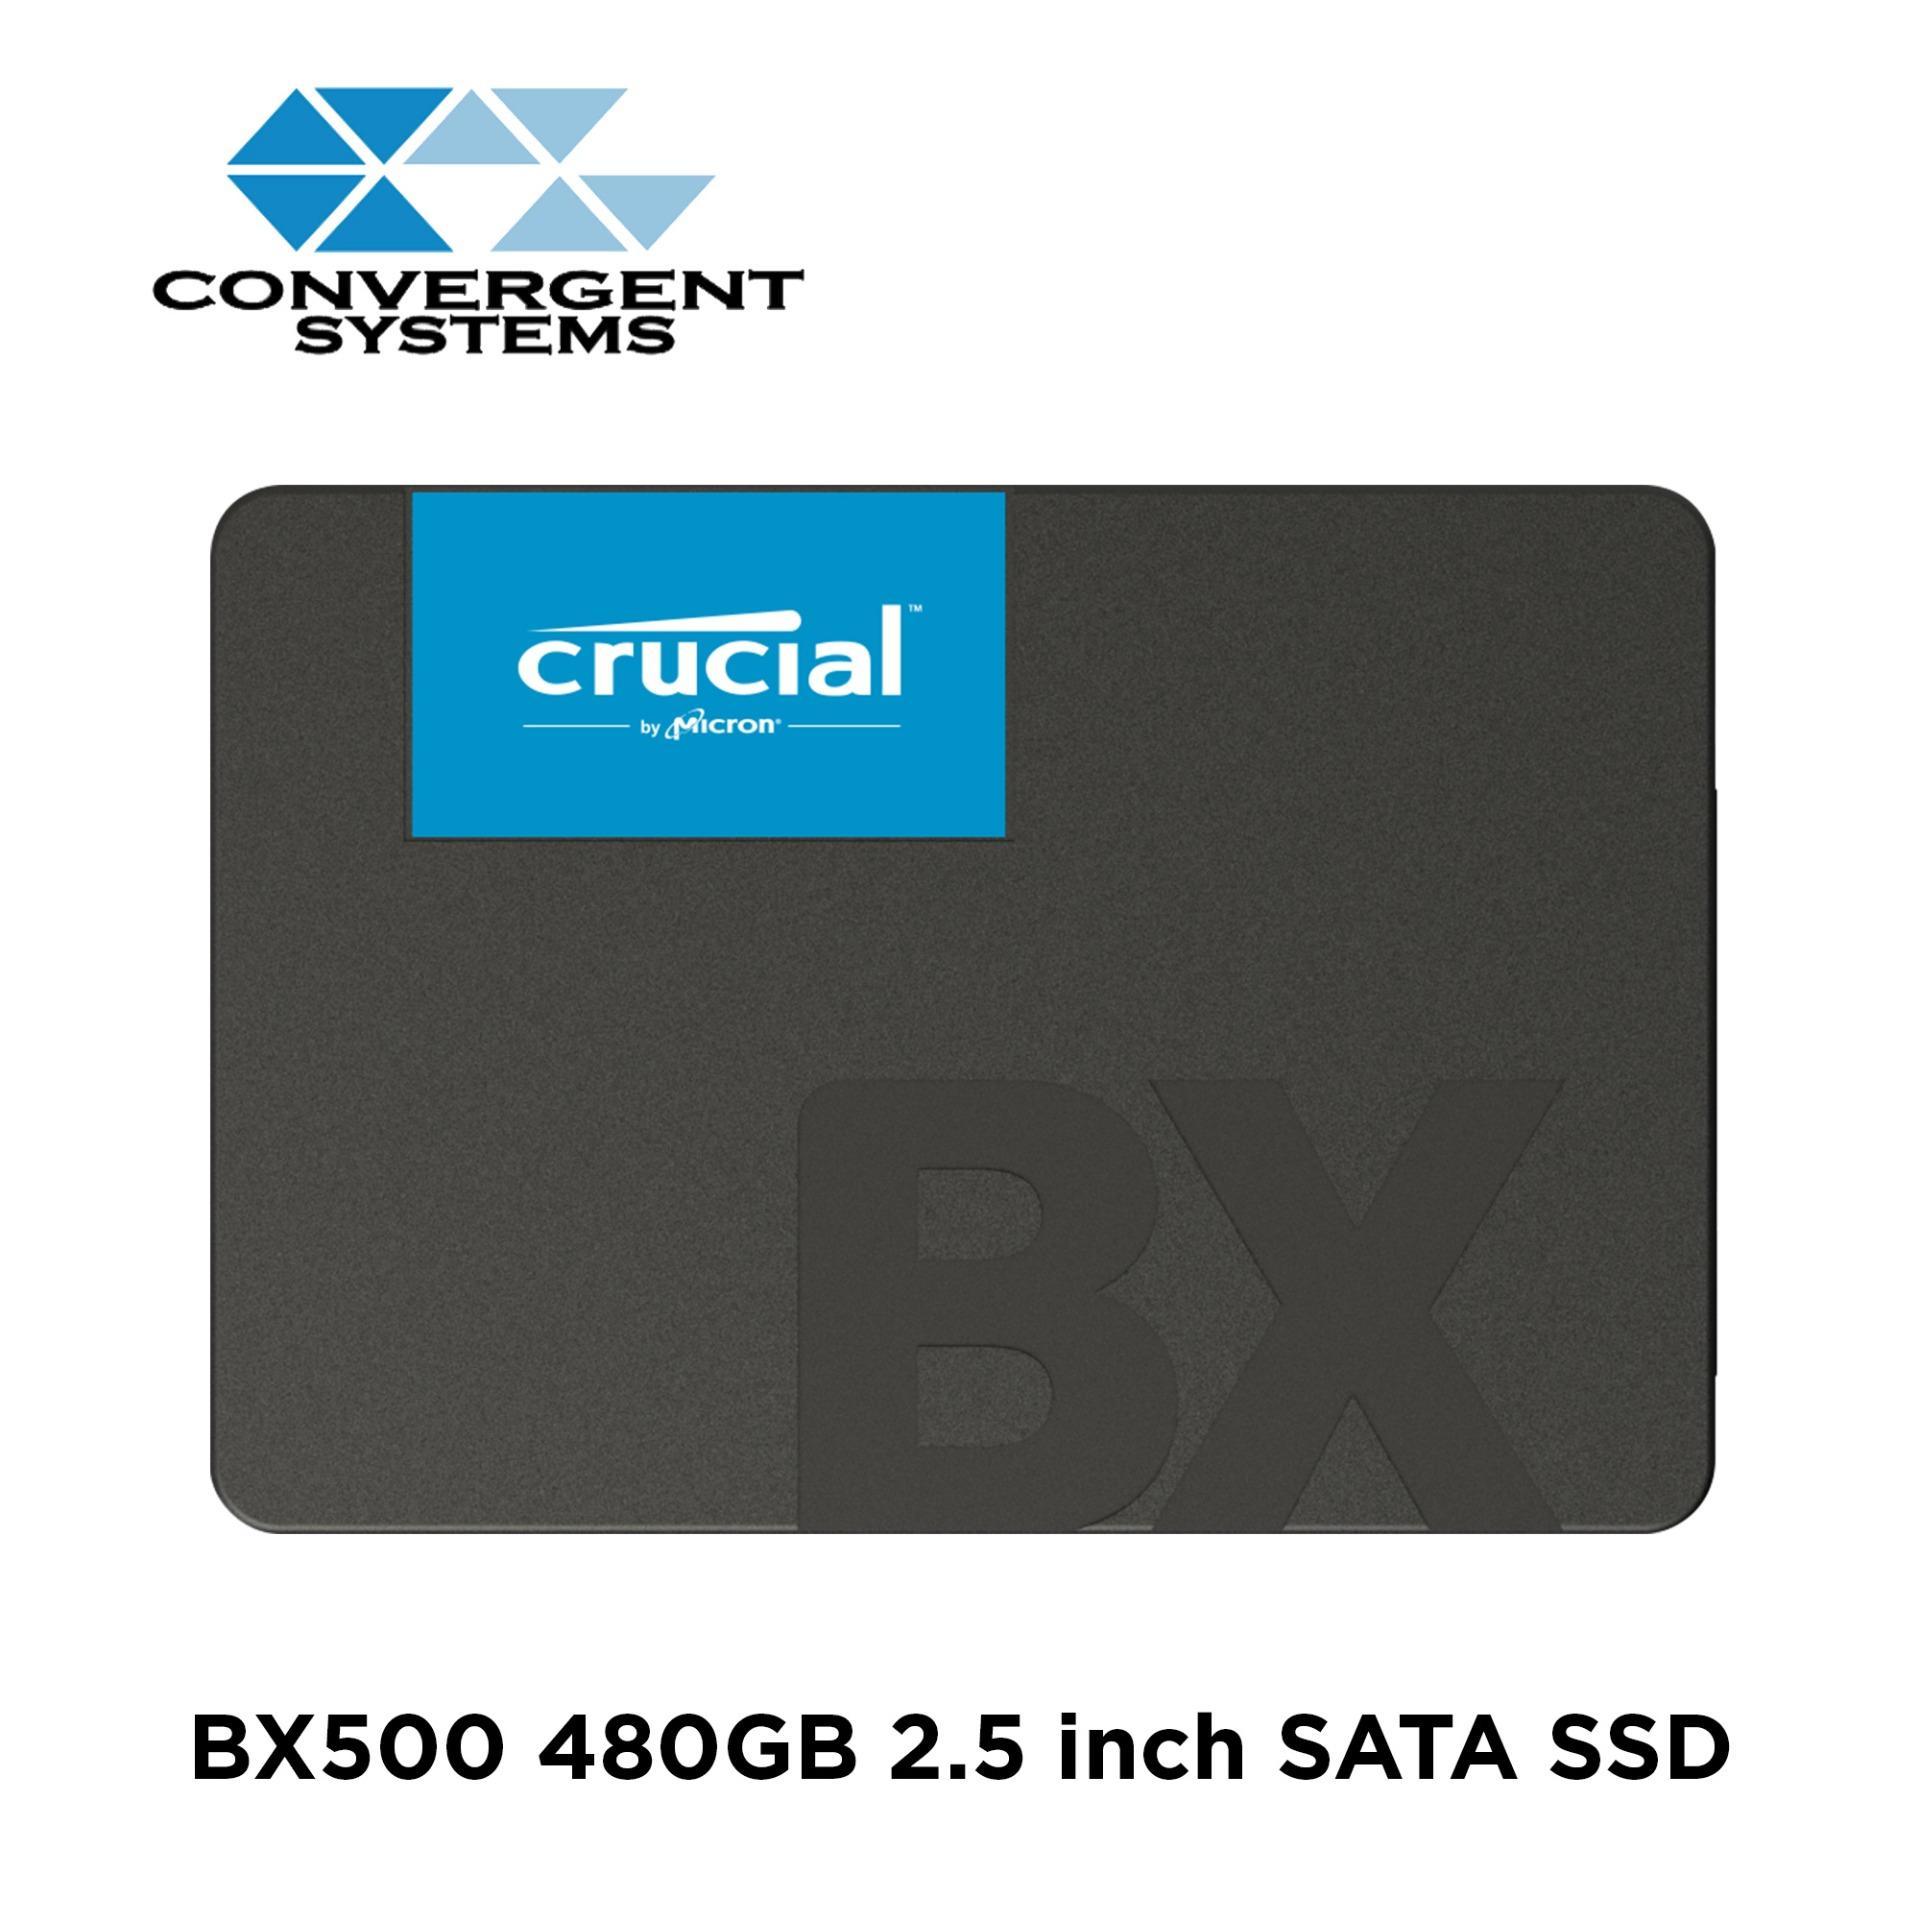 "Crucial 480GB BX500 2 5"" SATA SSD"